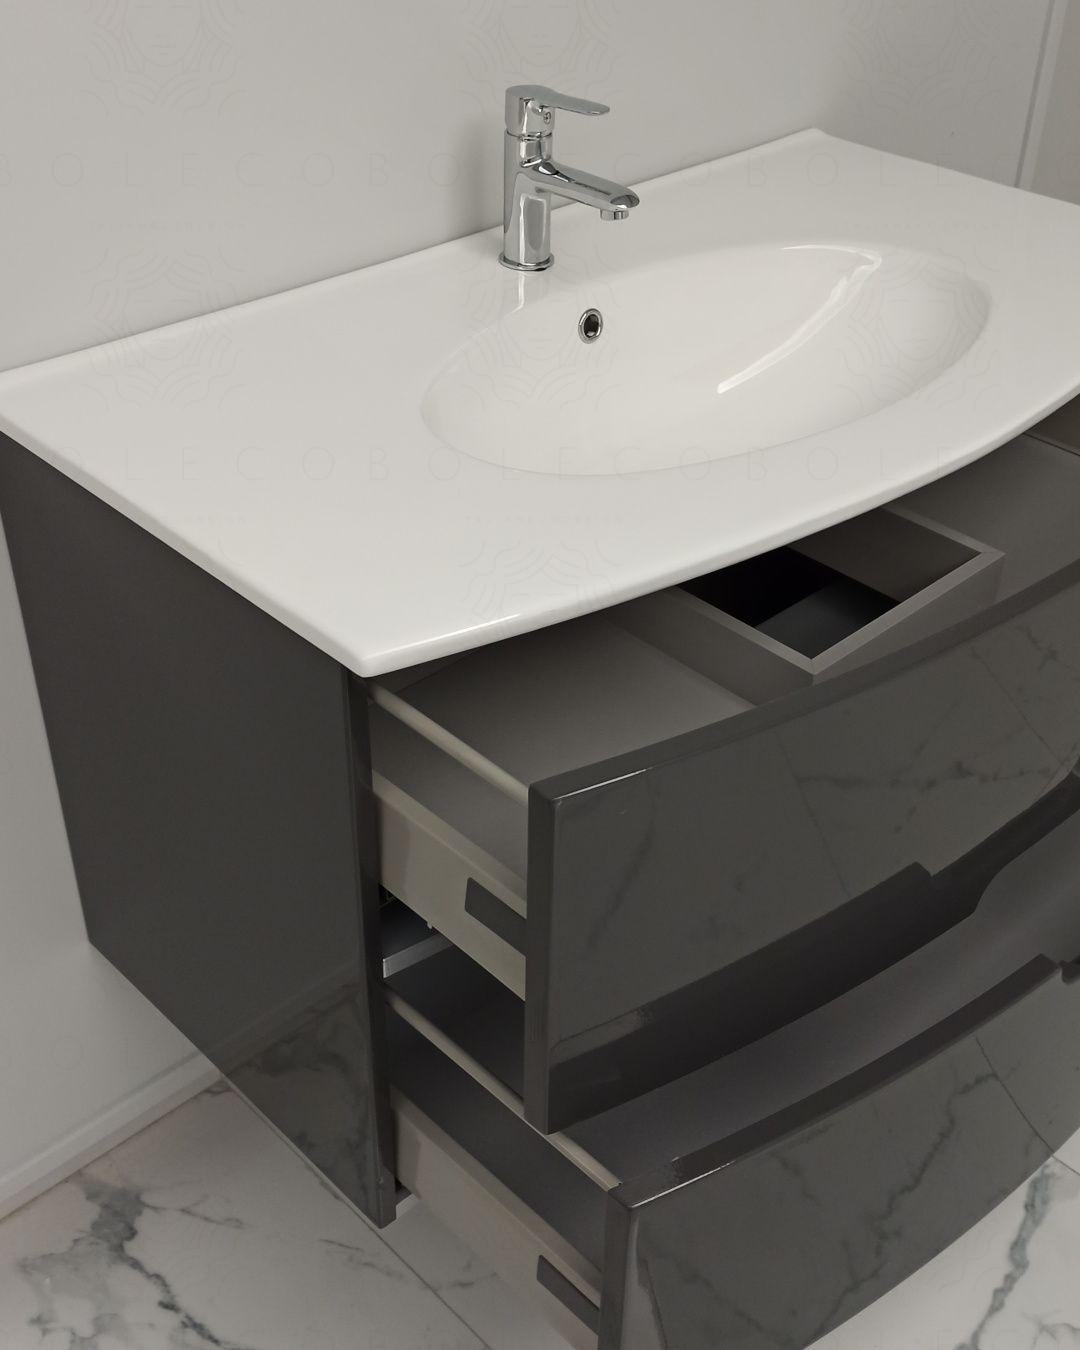 Mobile bagno sospeso Lady, curvo, con lavabo in ceramica, cm.100